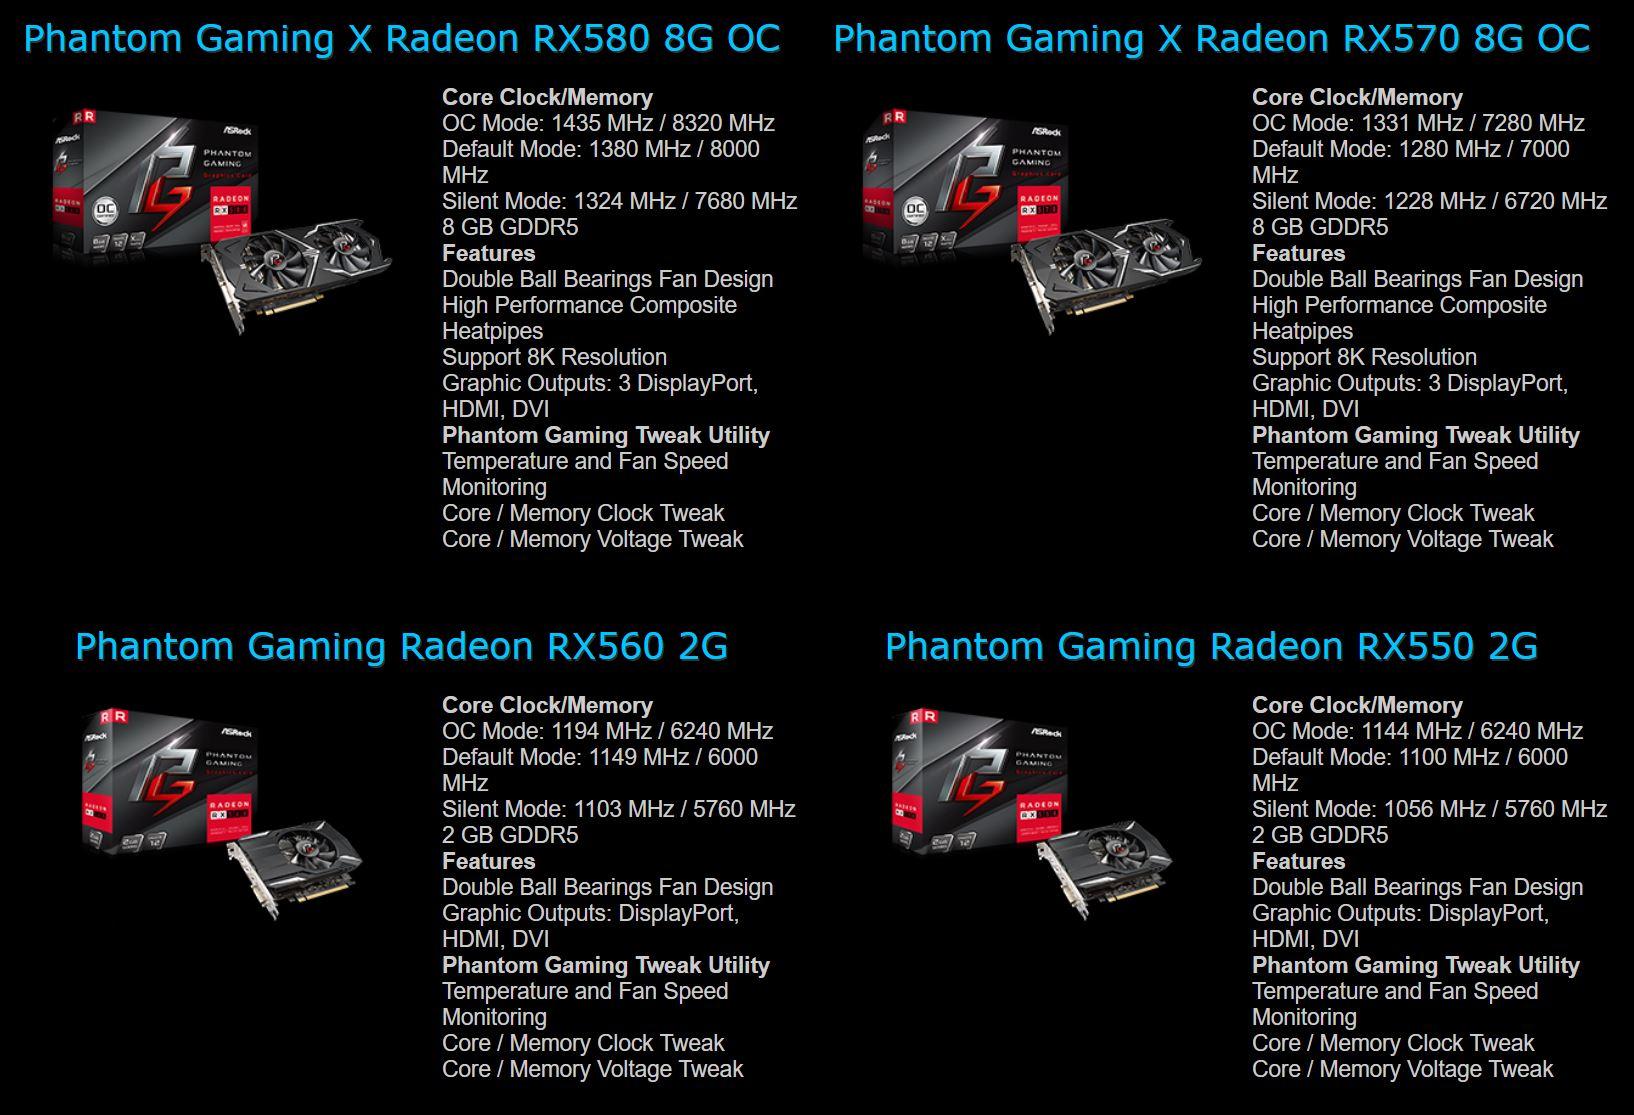 ASRock Radeon RX 500 Phantom Gaming Series leaked | VideoCardz com